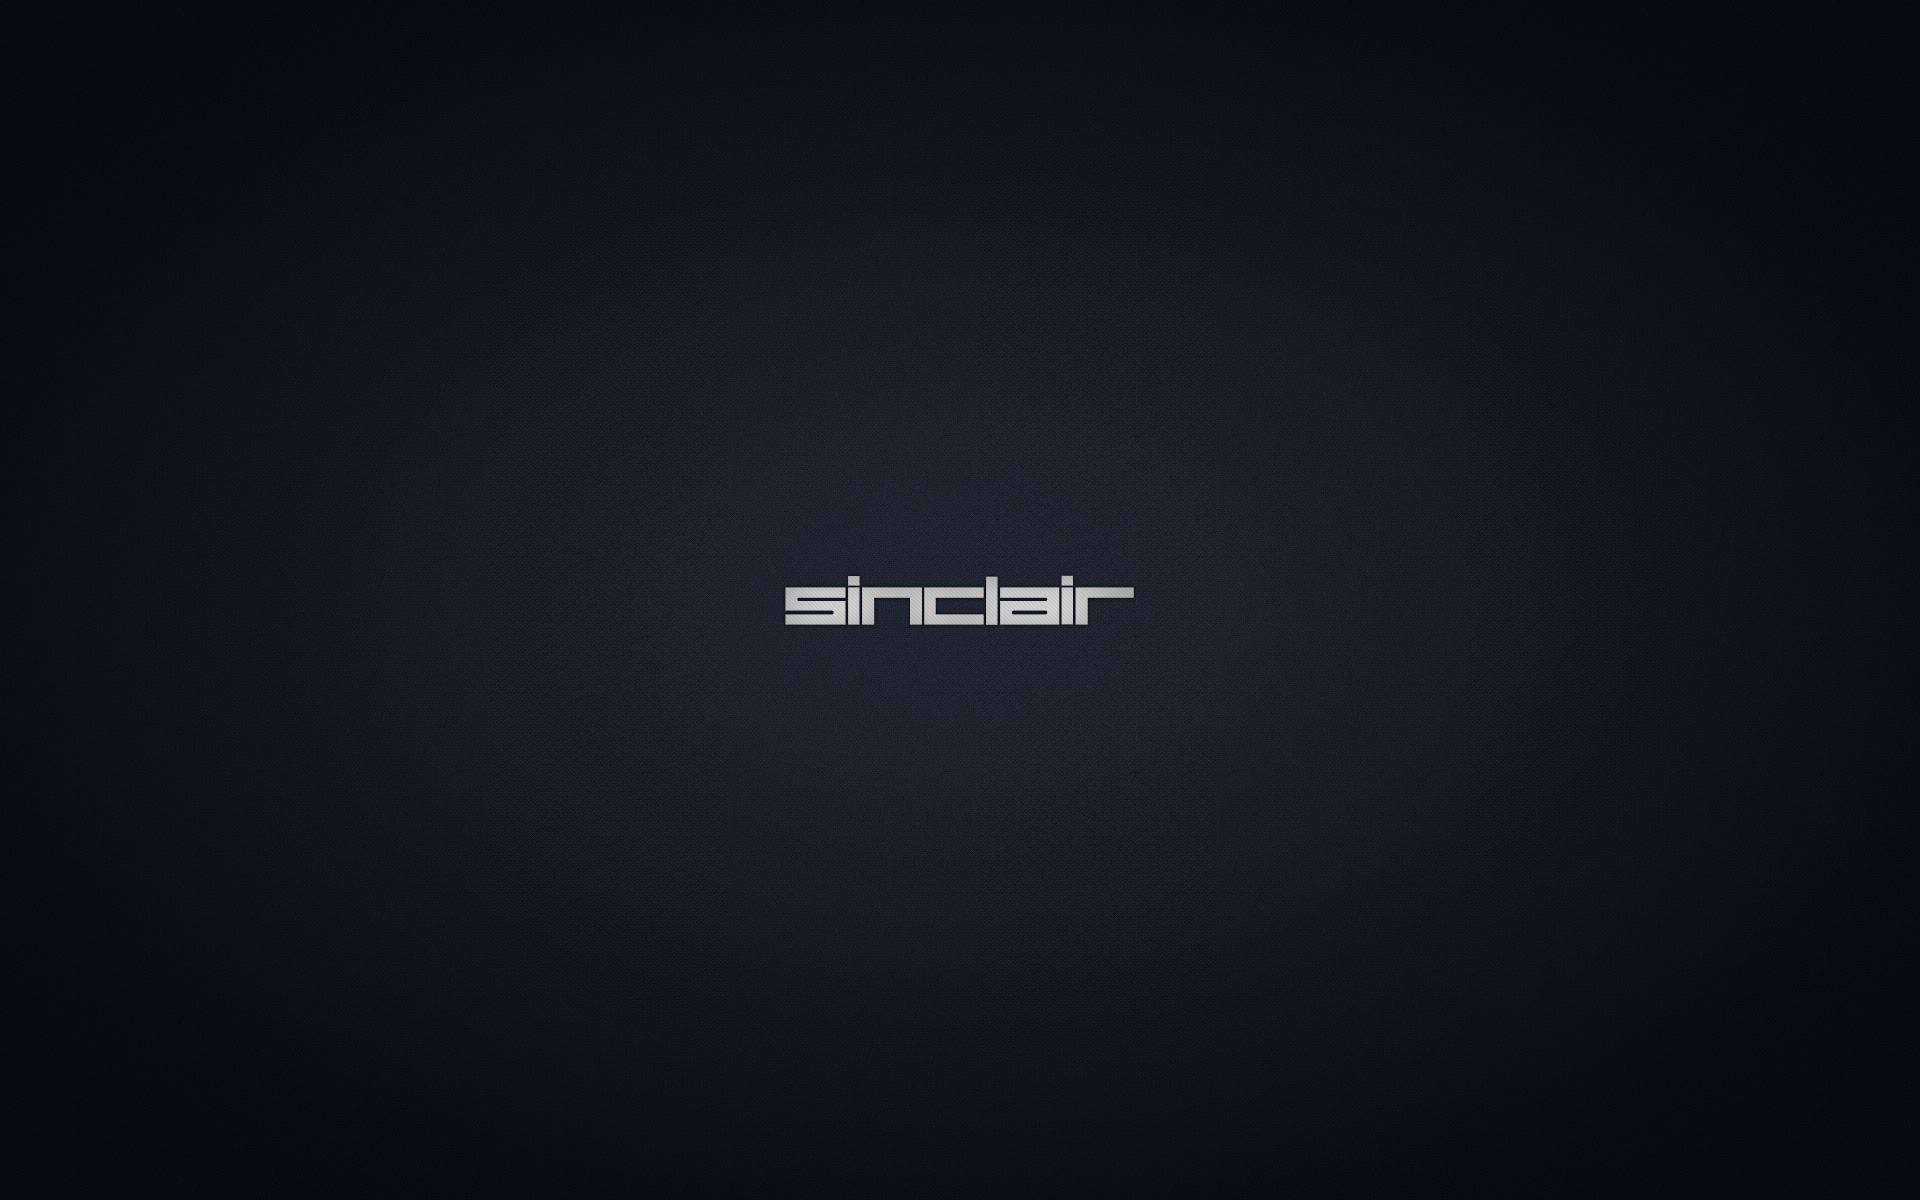 sinclair hd wallpaper dark blue by pixeloza customization wallpaper 1920x1200